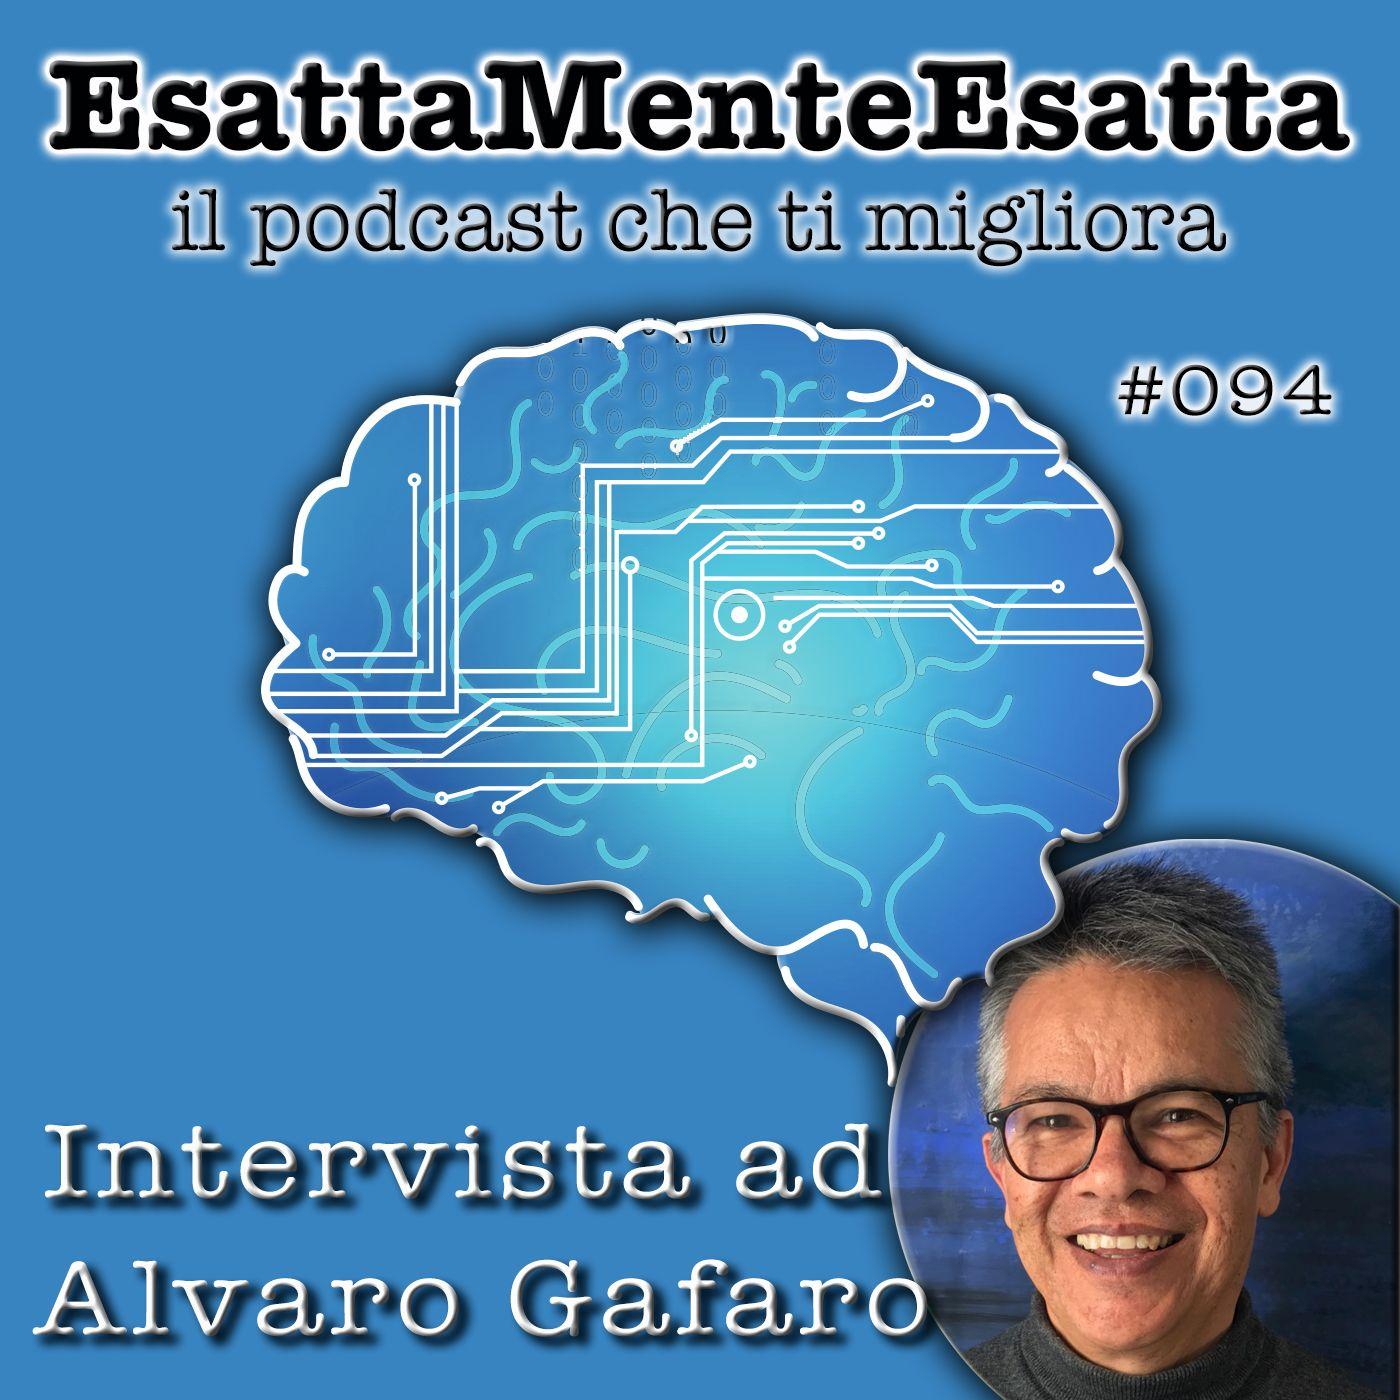 Intervista: Alvaro Gafaro si racconta #094